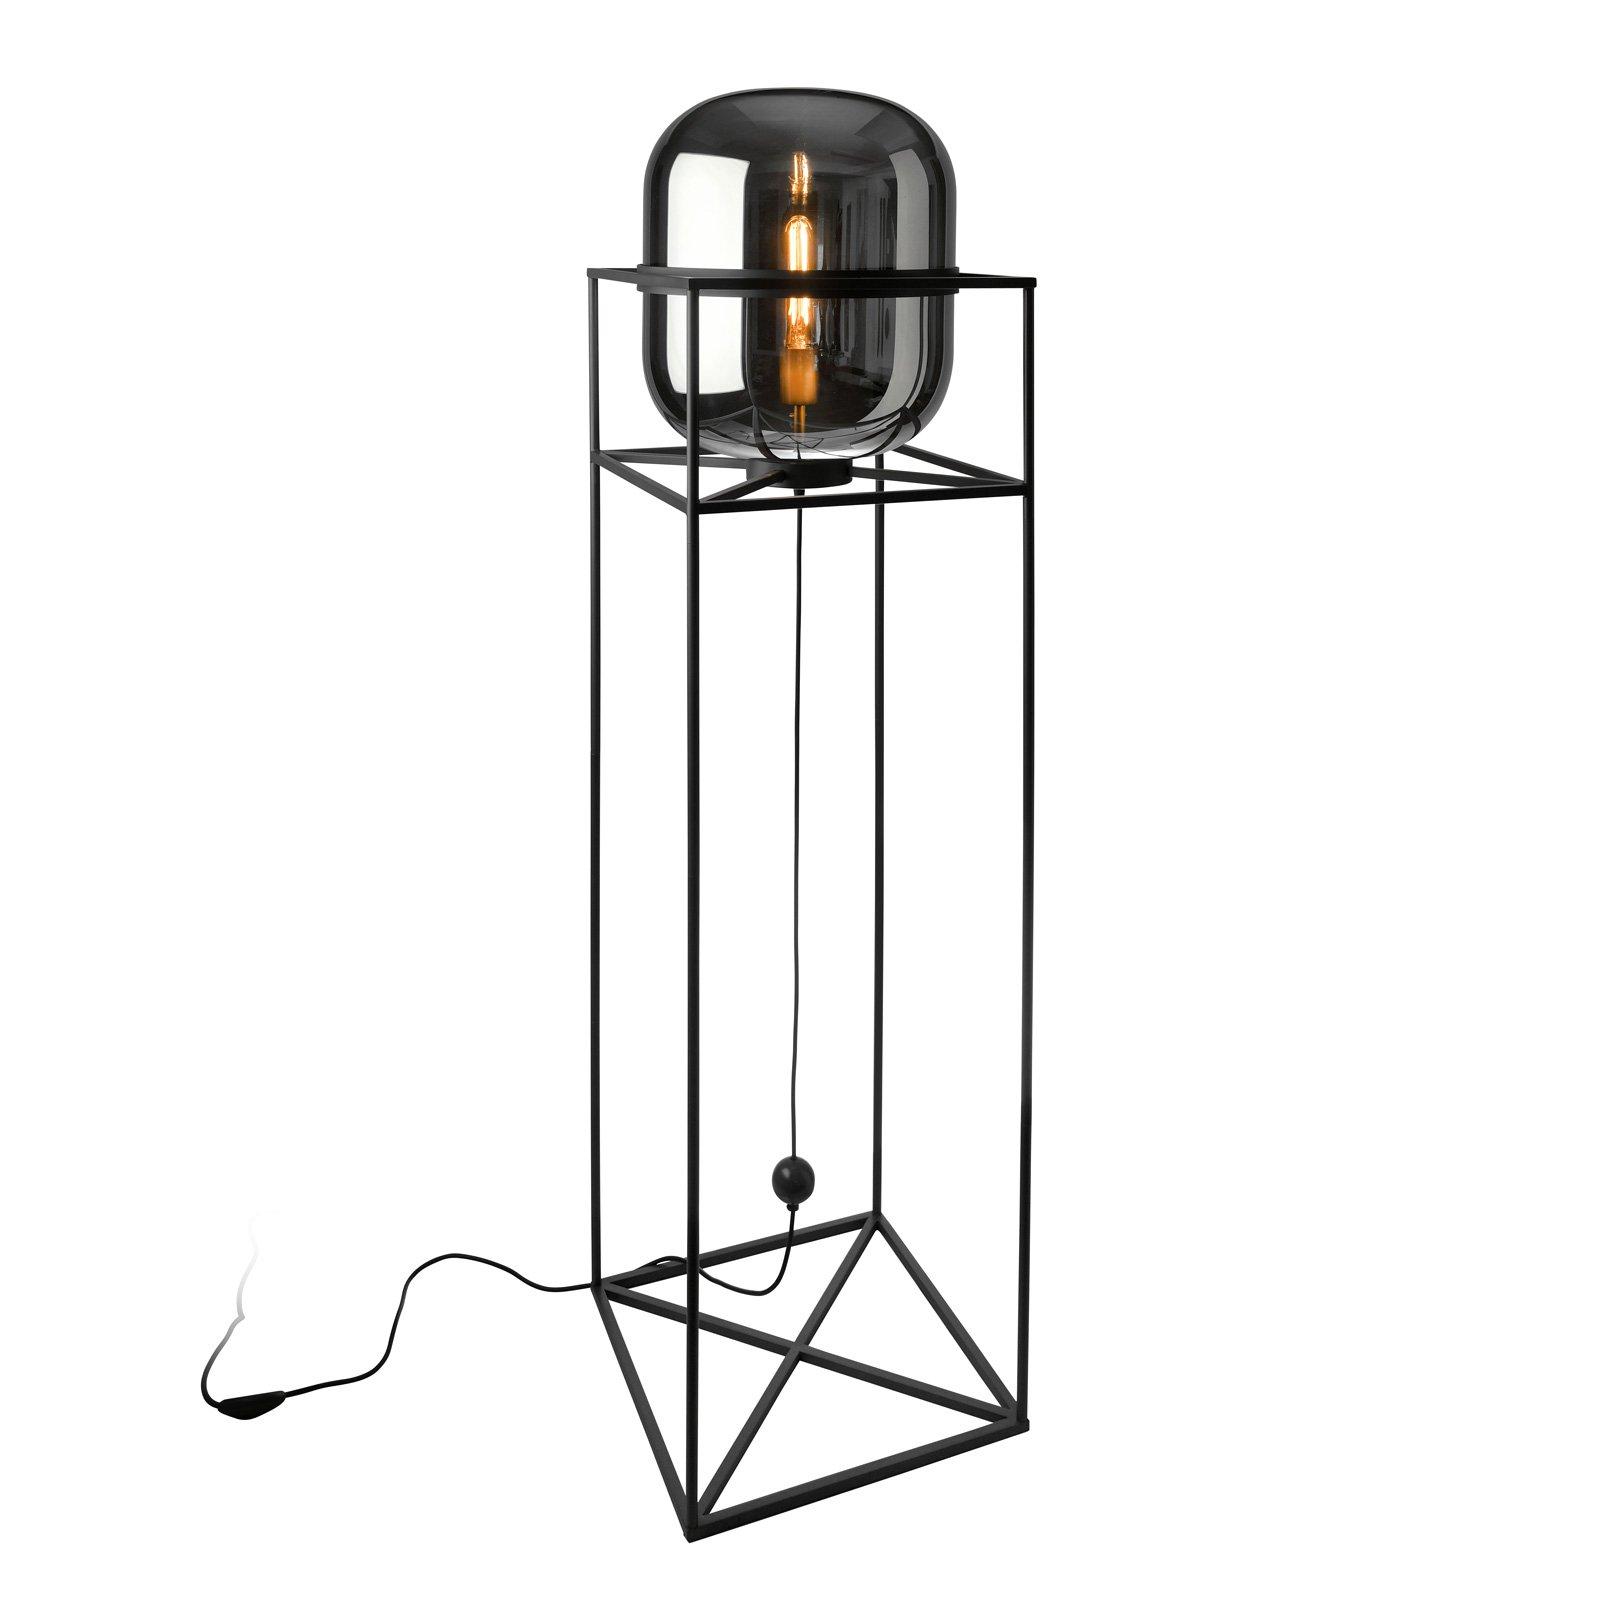 Gulvlampe Baloni, metallstamme og røykglass